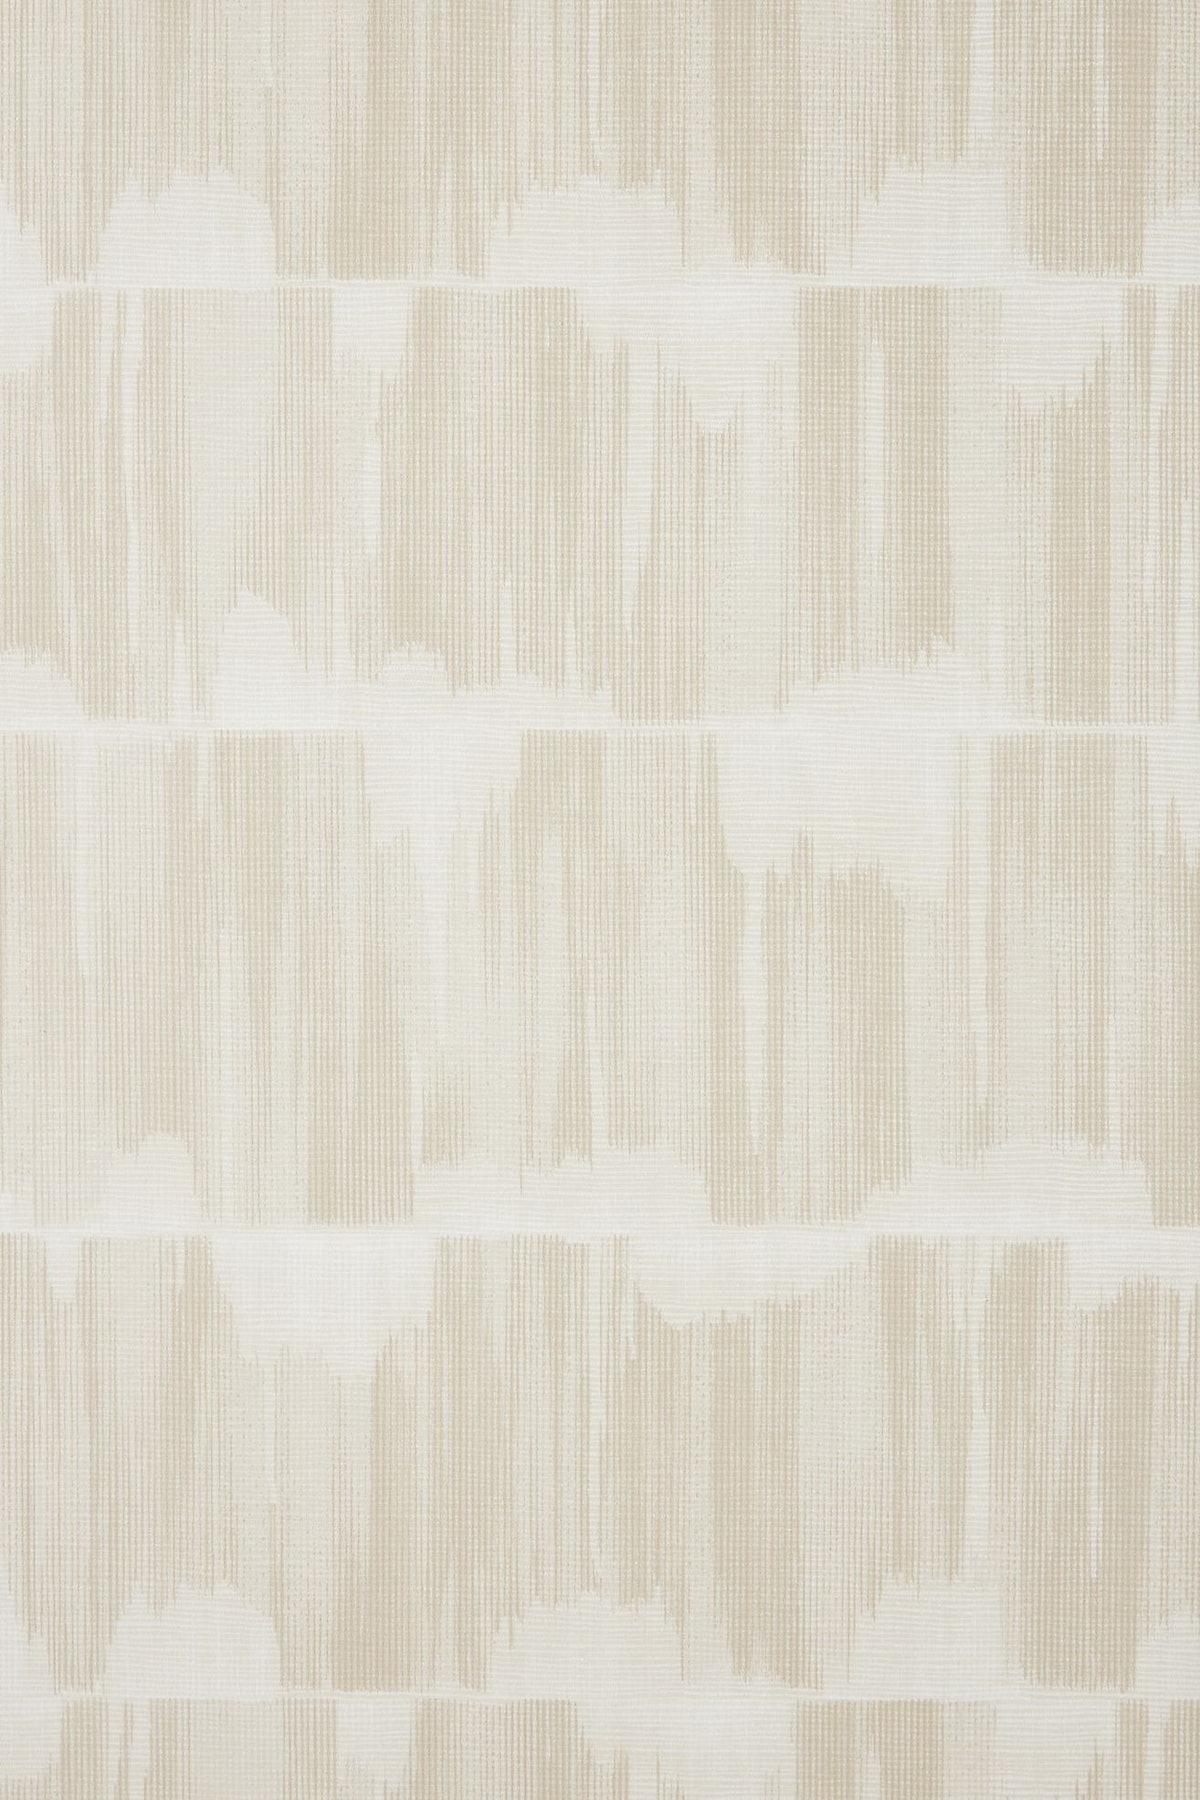 Serendipity Shibori Wallpaper